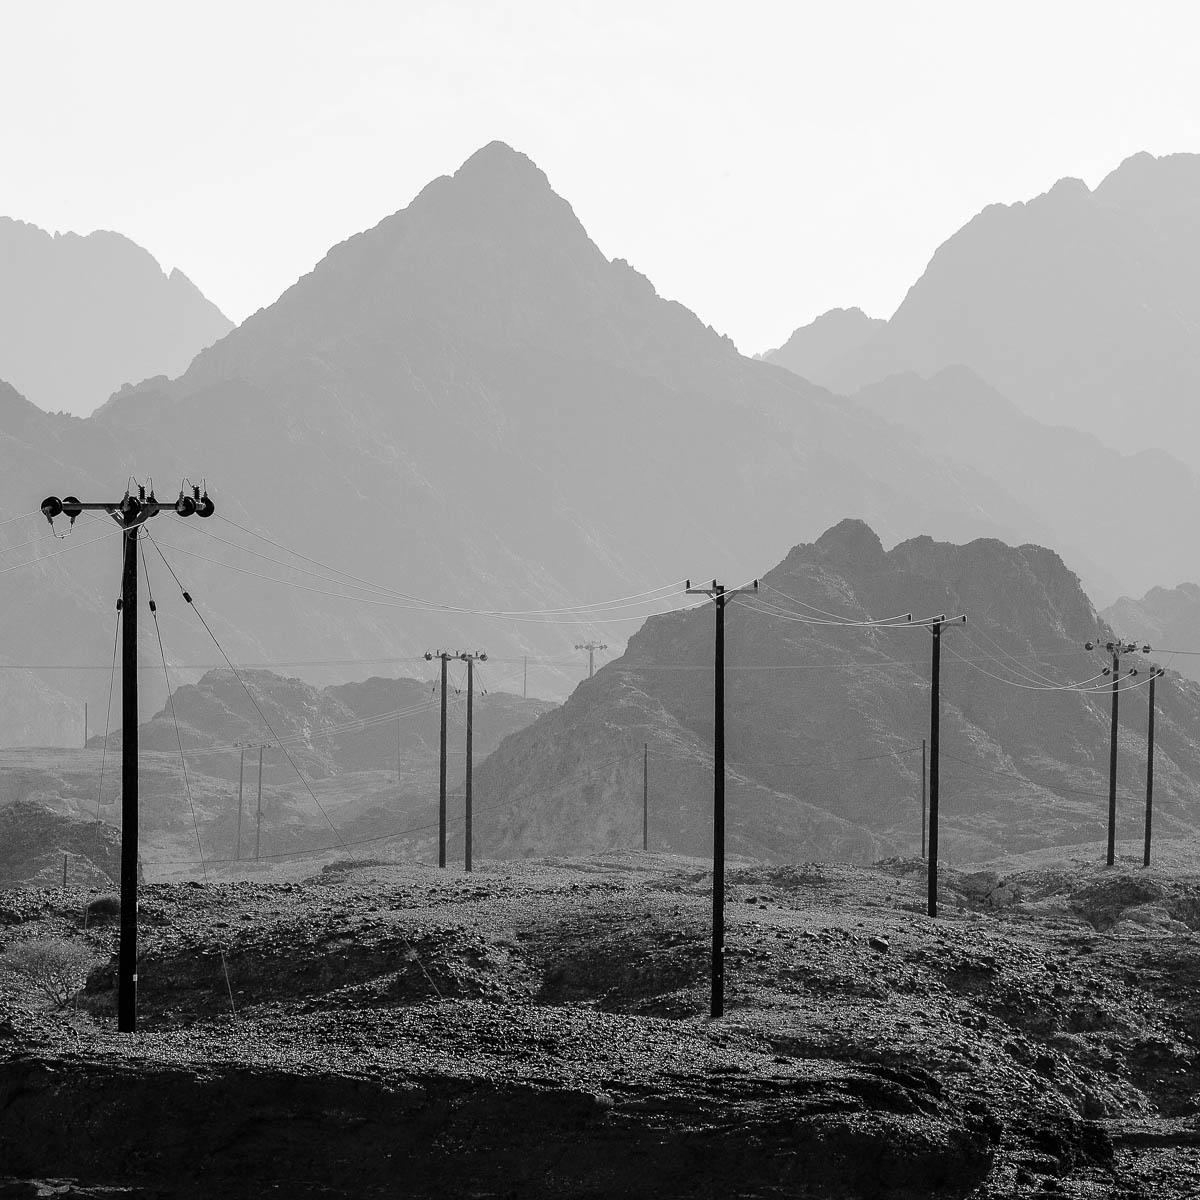 Powerlines traverse the remote Hajar Mountain region of Dubai, UAE